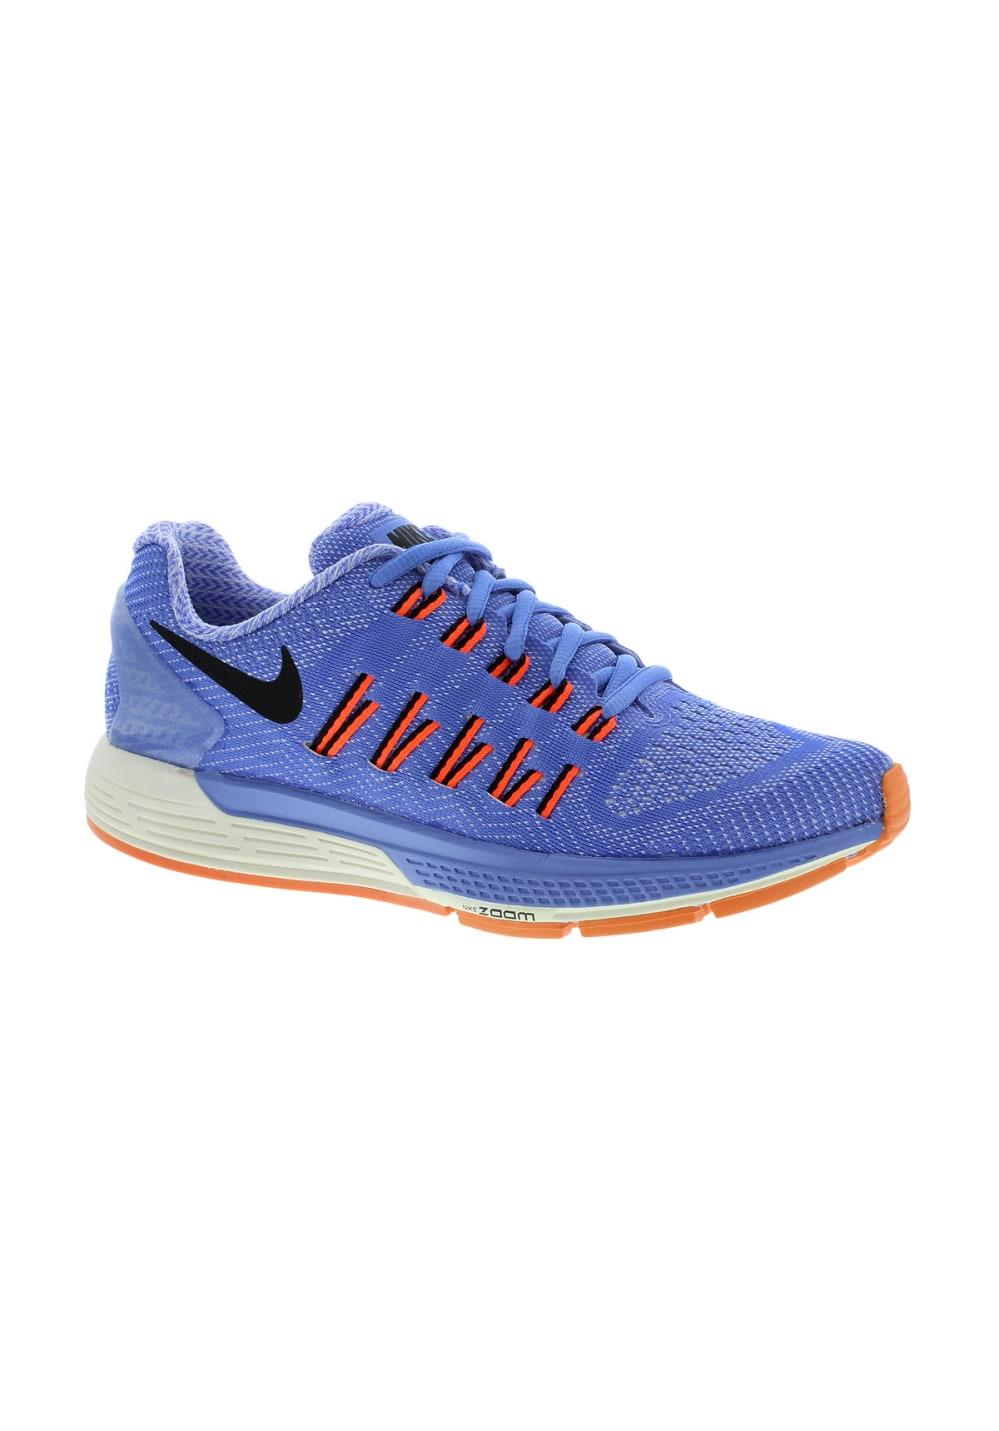 Nike Air Zoom Odyssey - Laufschuhe für Damen - Blau